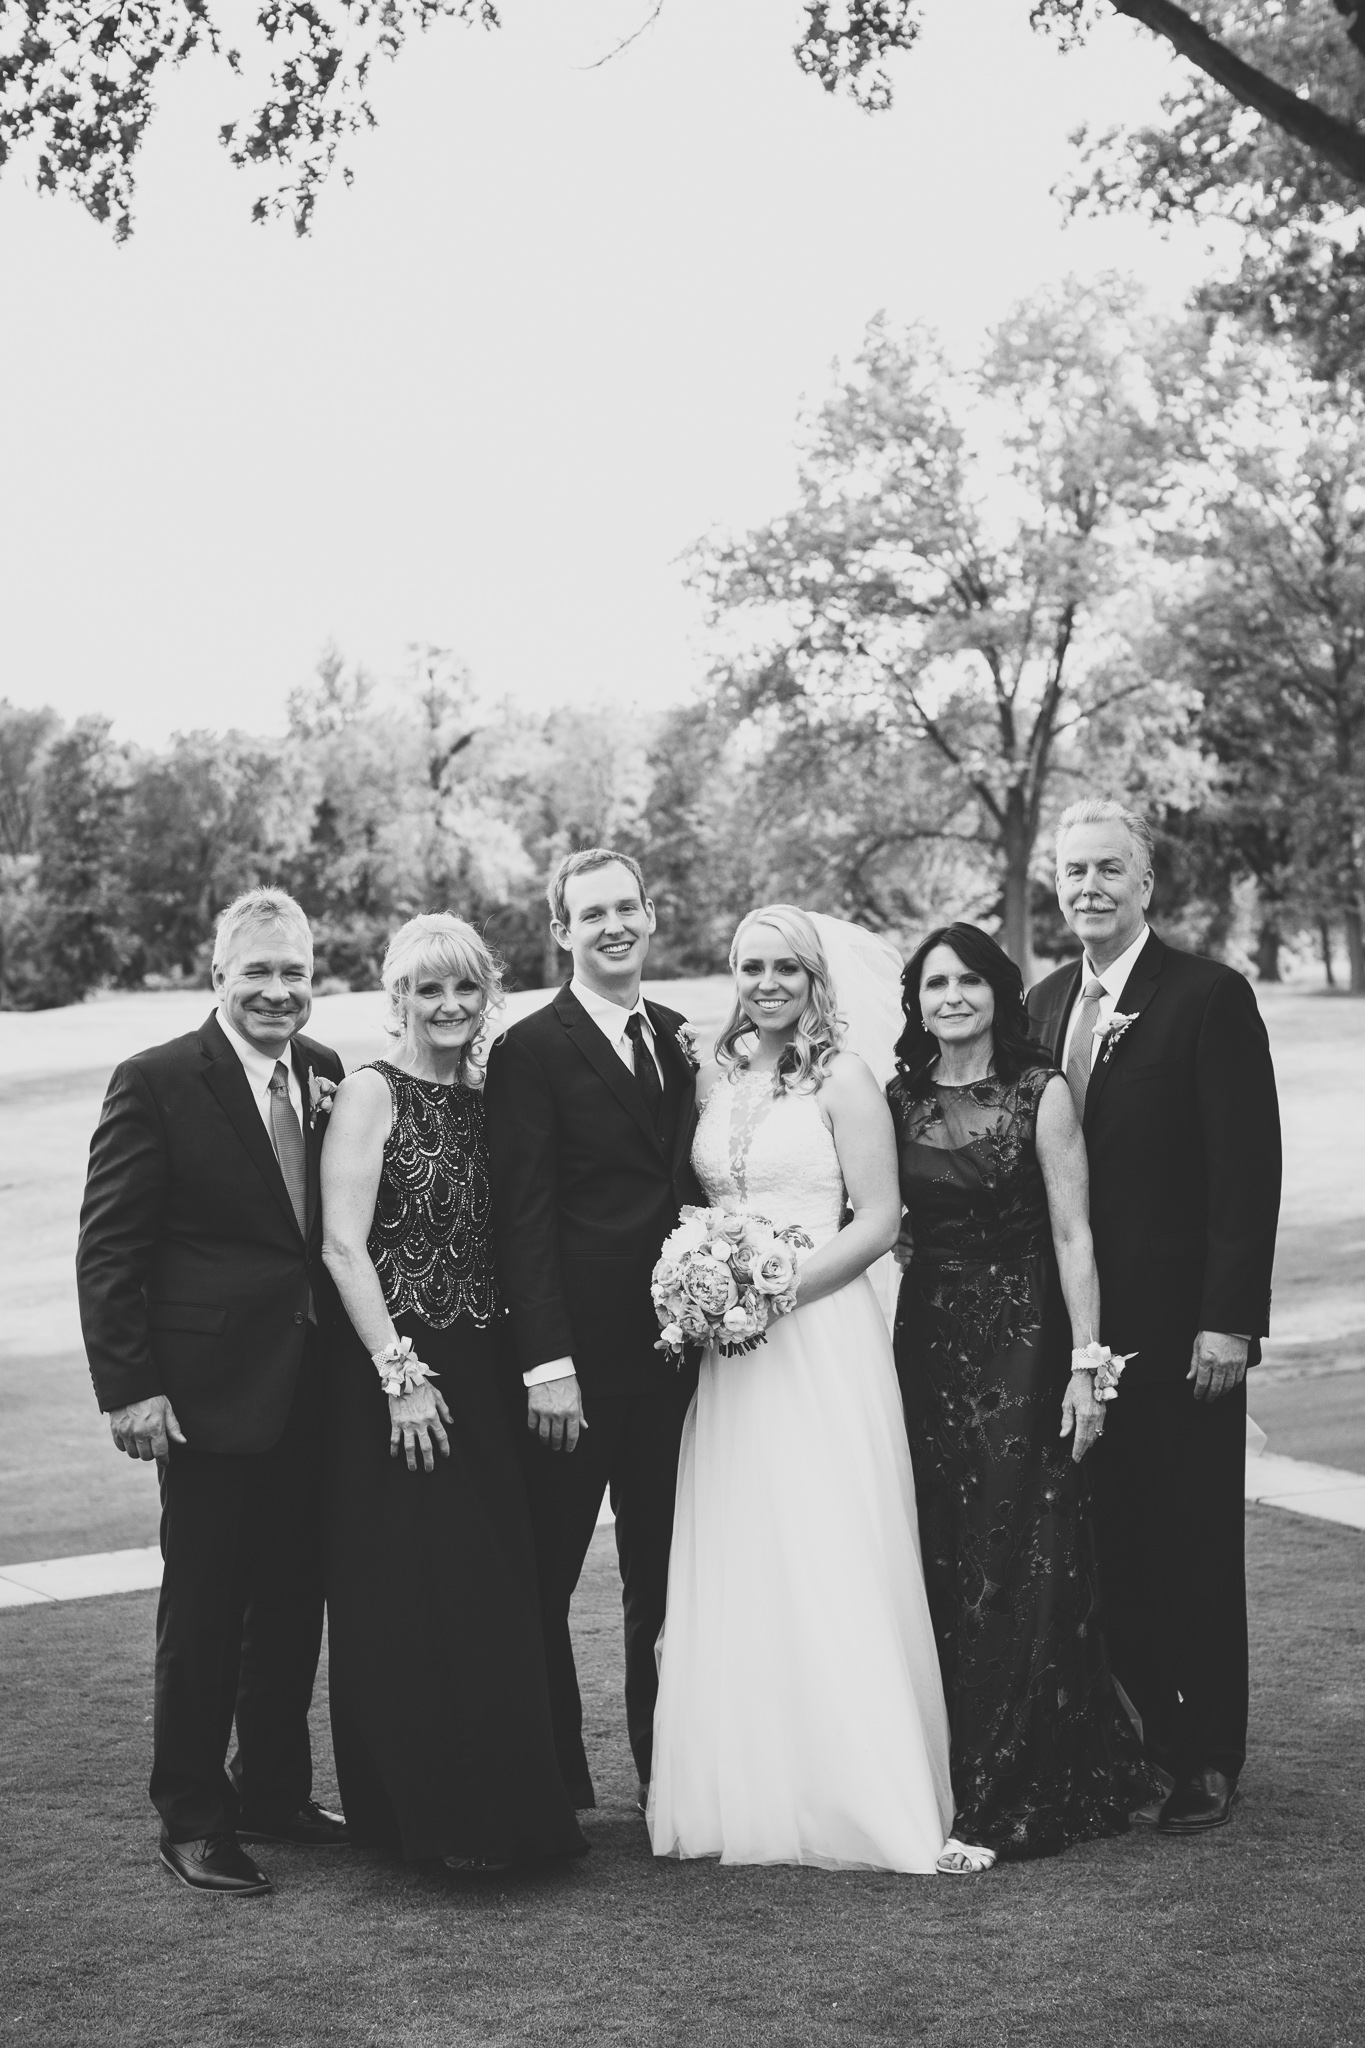 107-best-detroit-michigan-outdoor-wedding-photographer.jpg